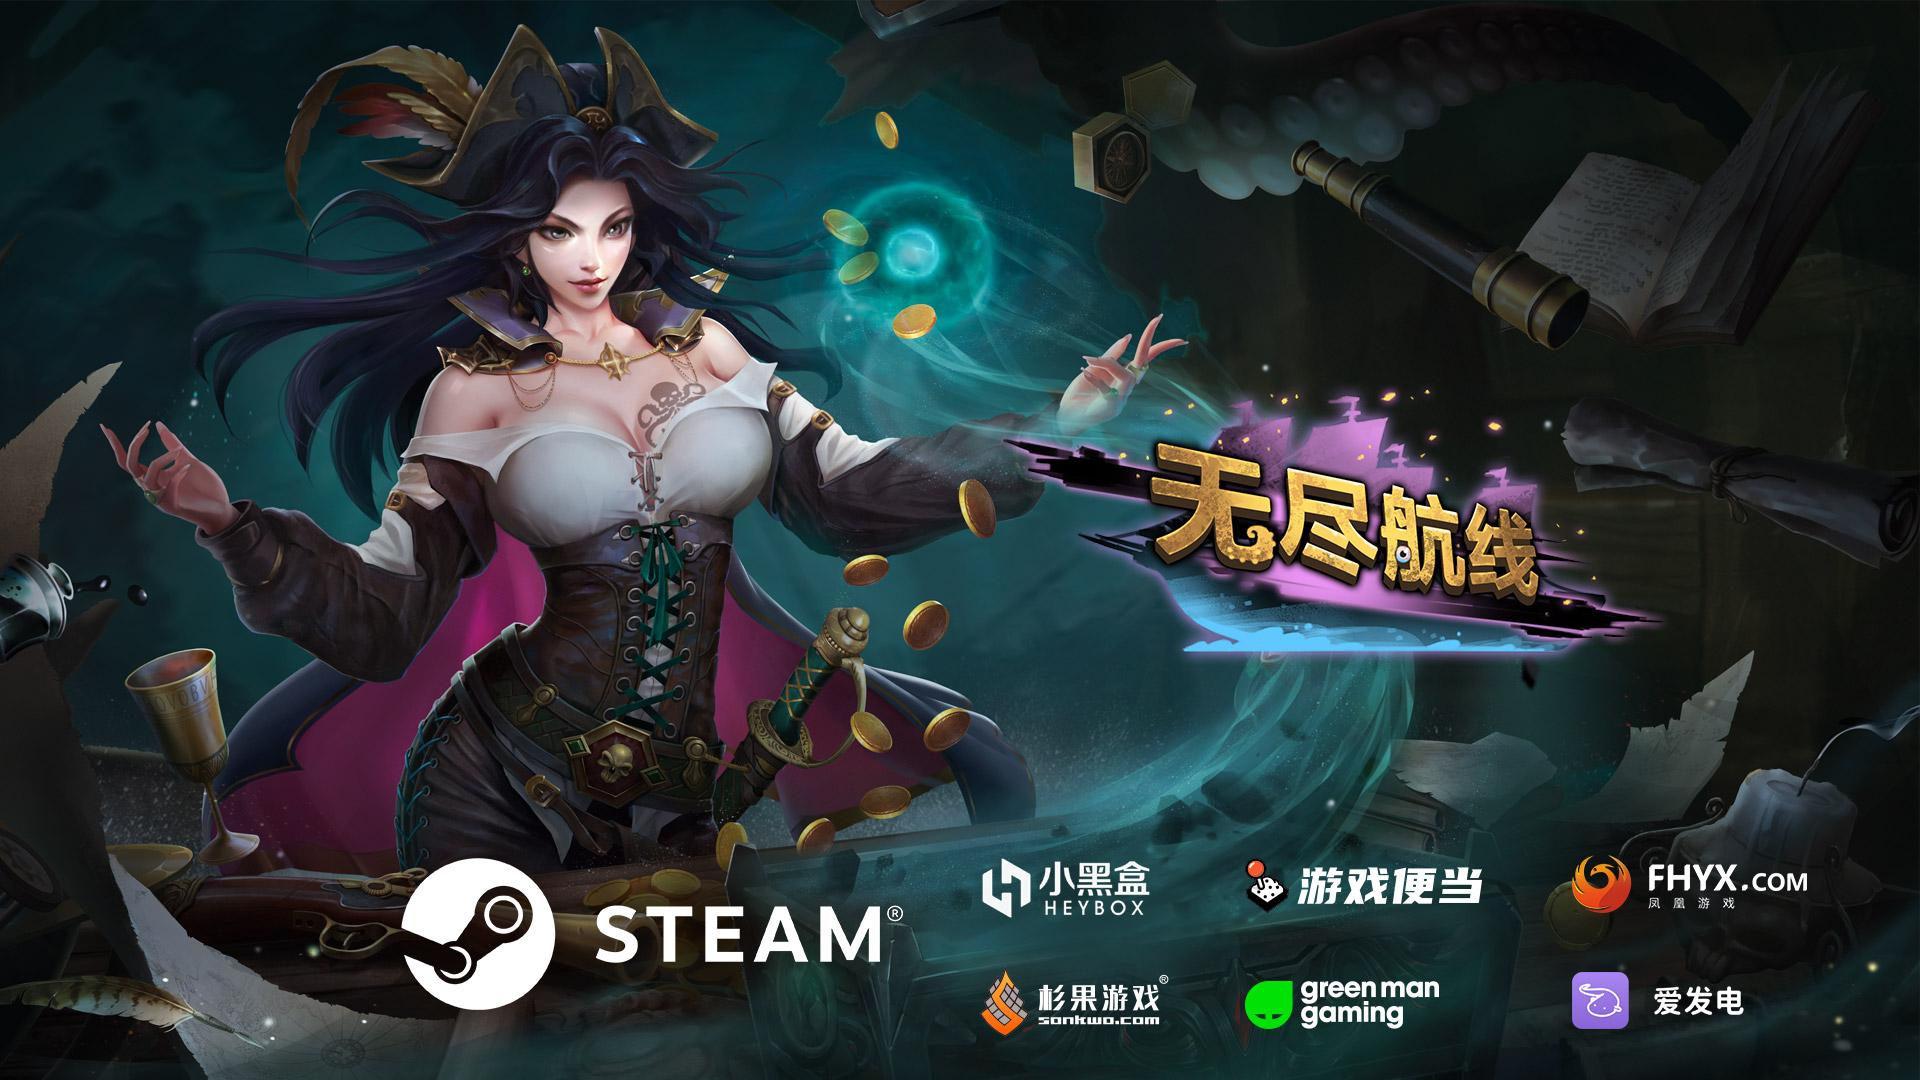 Roguelike卡牌构筑游戏《无尽航线》今日开启Steam发售 定价58元